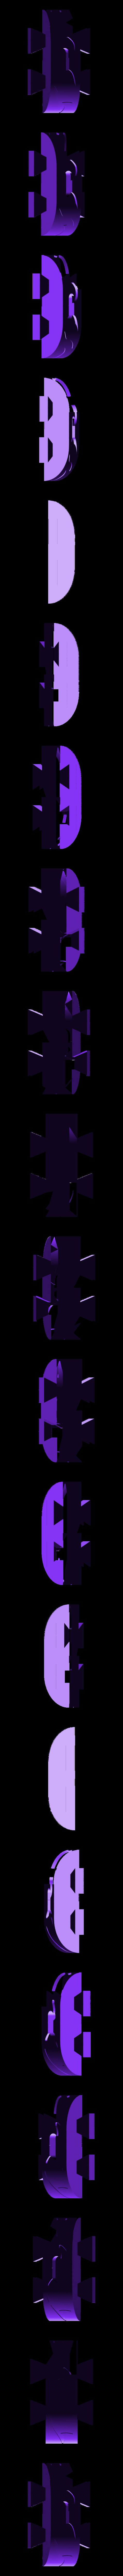 DockingBase.stl Download free STL file Prayer wheel (With frame) • 3D printing template, NickChung